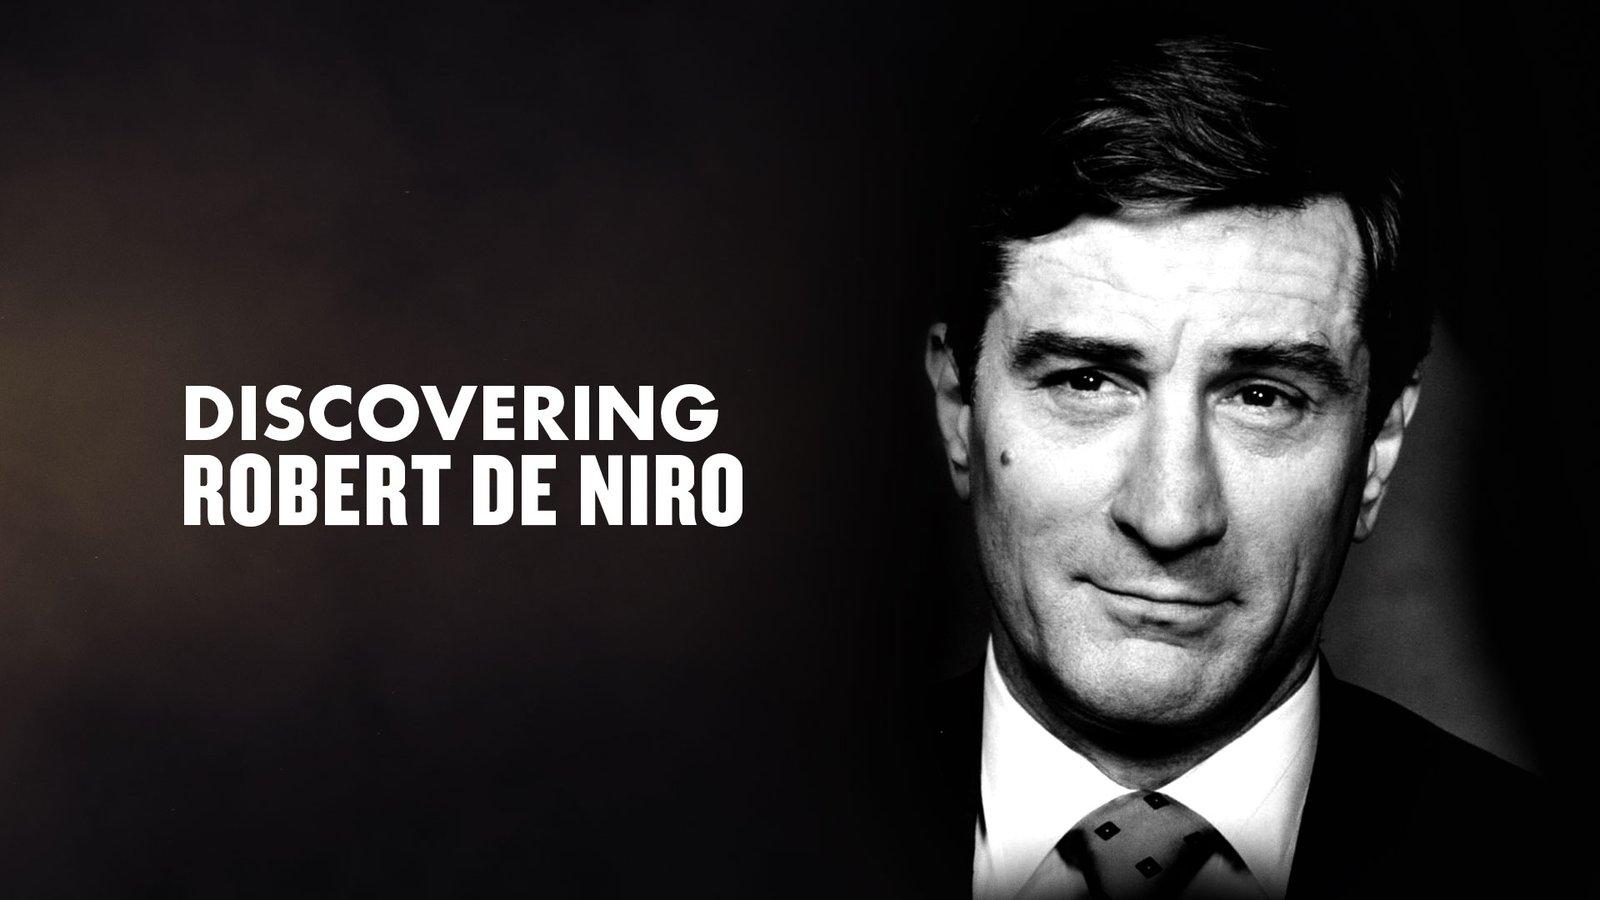 Discovering Robert De Niro